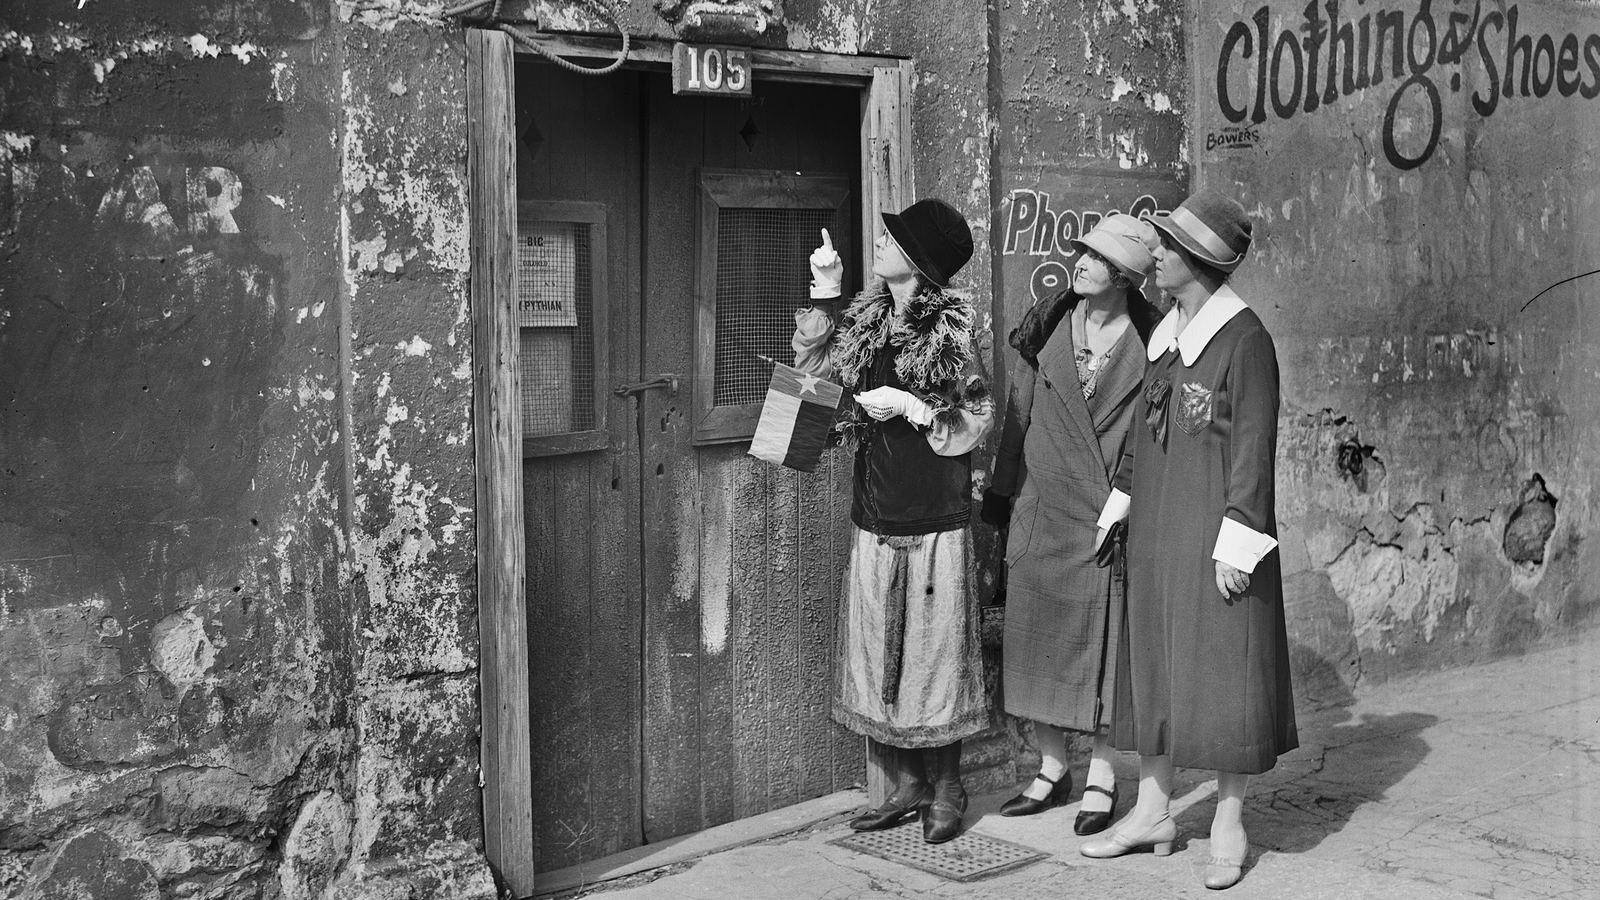 hispanic single women in alamo Some famous hispanic women, highlighting a few of the hispanic women who've made contributions to history.